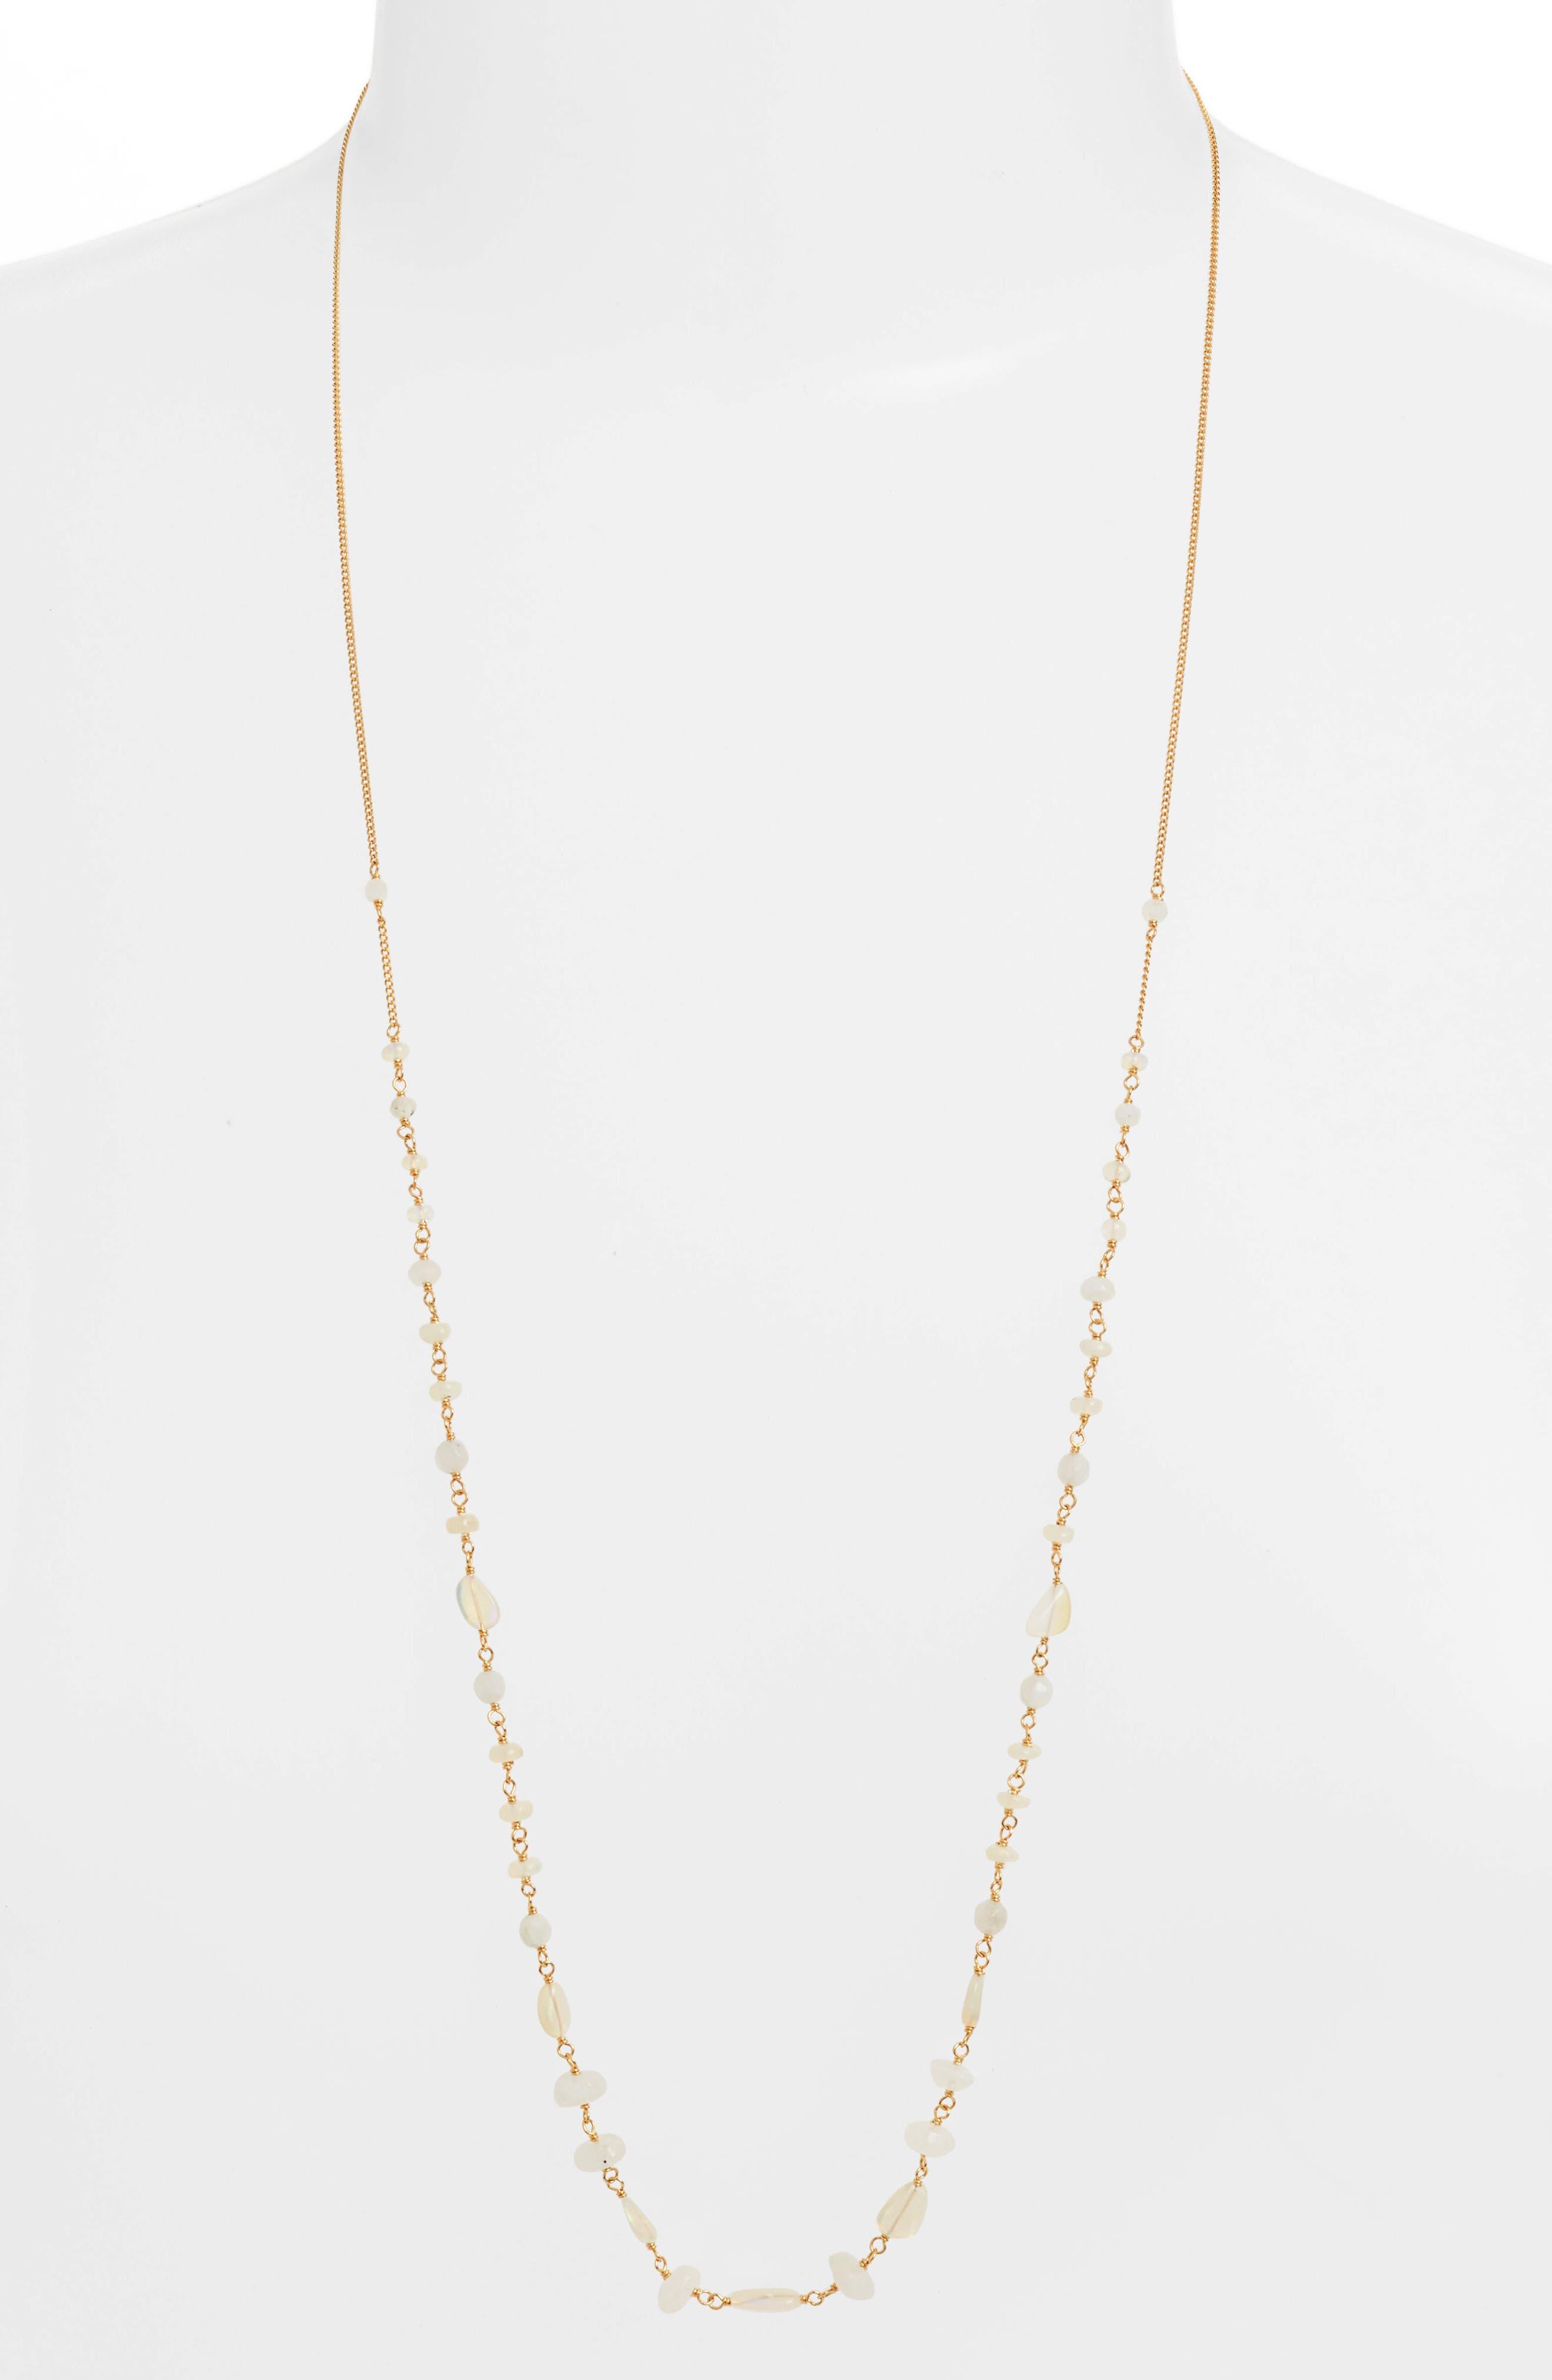 Opal Layering Necklace,                             Main thumbnail 1, color,                             ETHIOPIAN OPAL